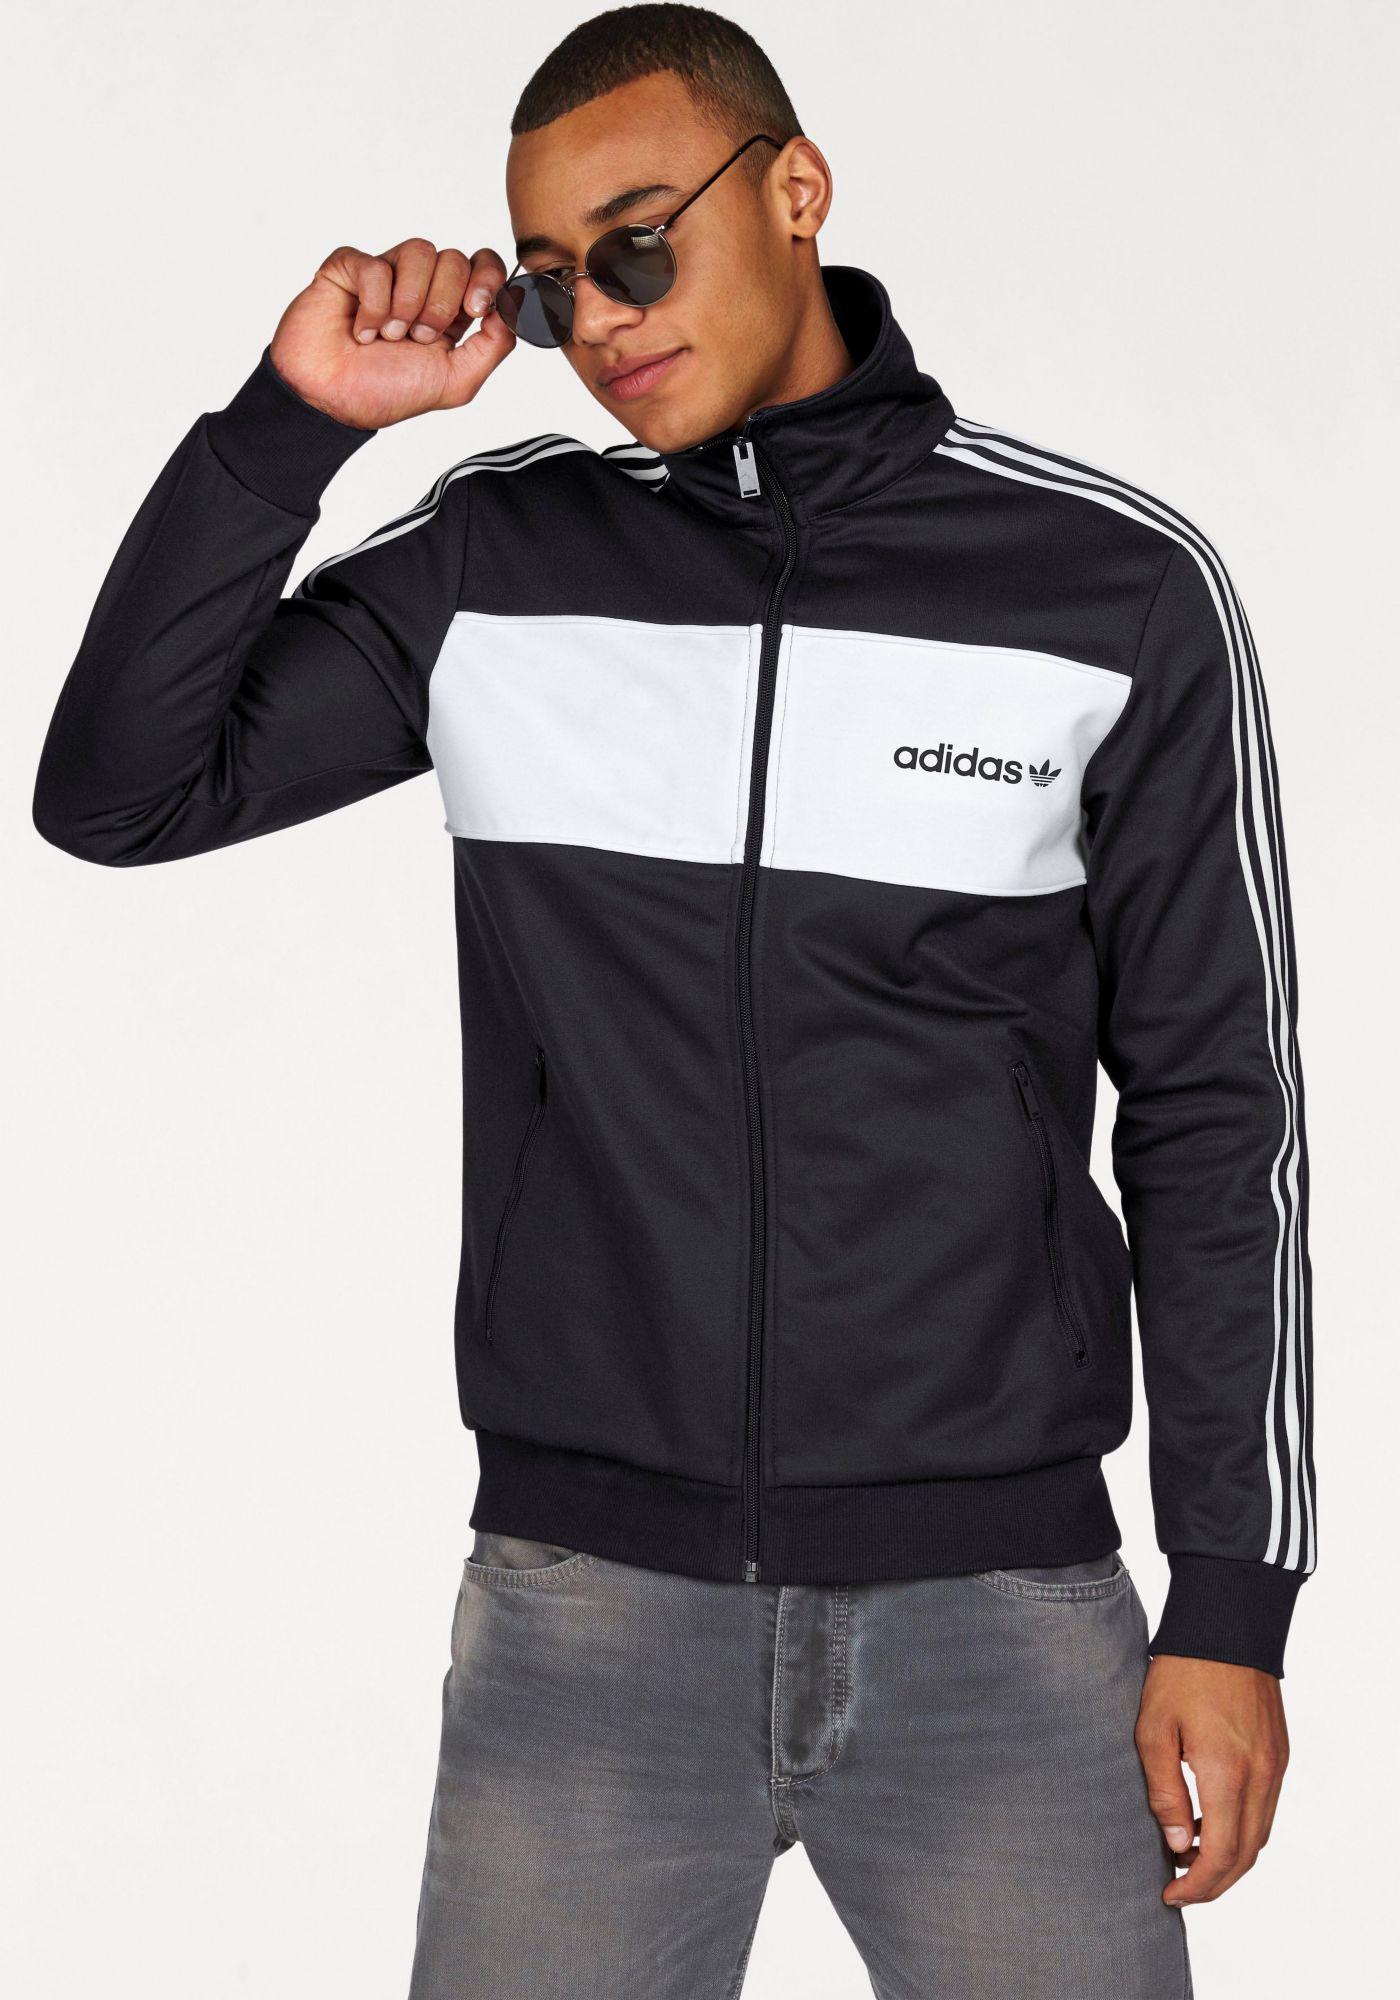 ADIDAS ORIGINALS adidas Originals Sweatjacke »BLOCKTRACK TOP«